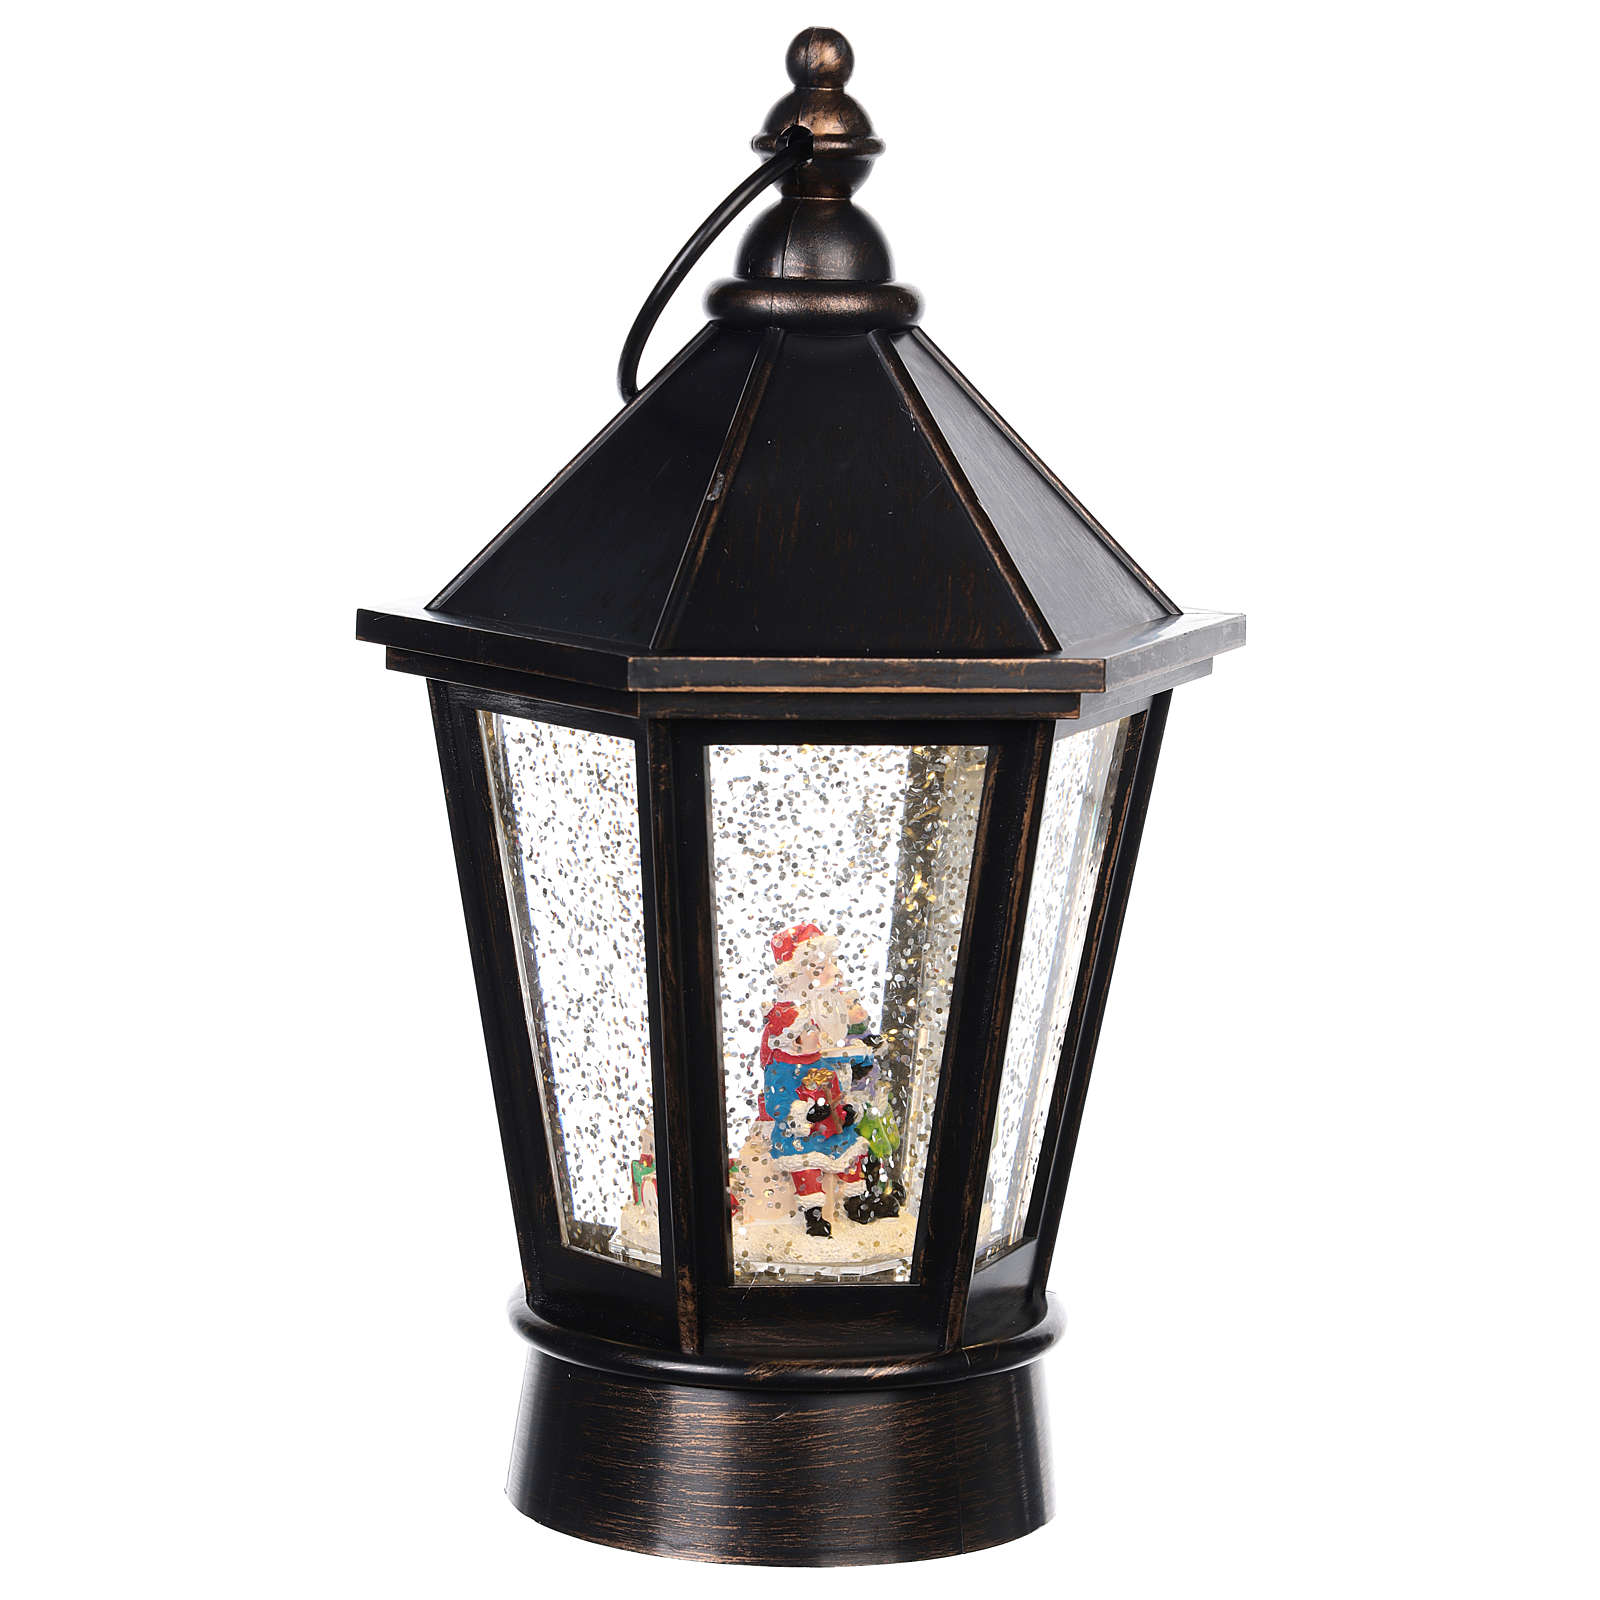 Lanterna di vetro lanterna con Babbo Natale 25x10 cm 3